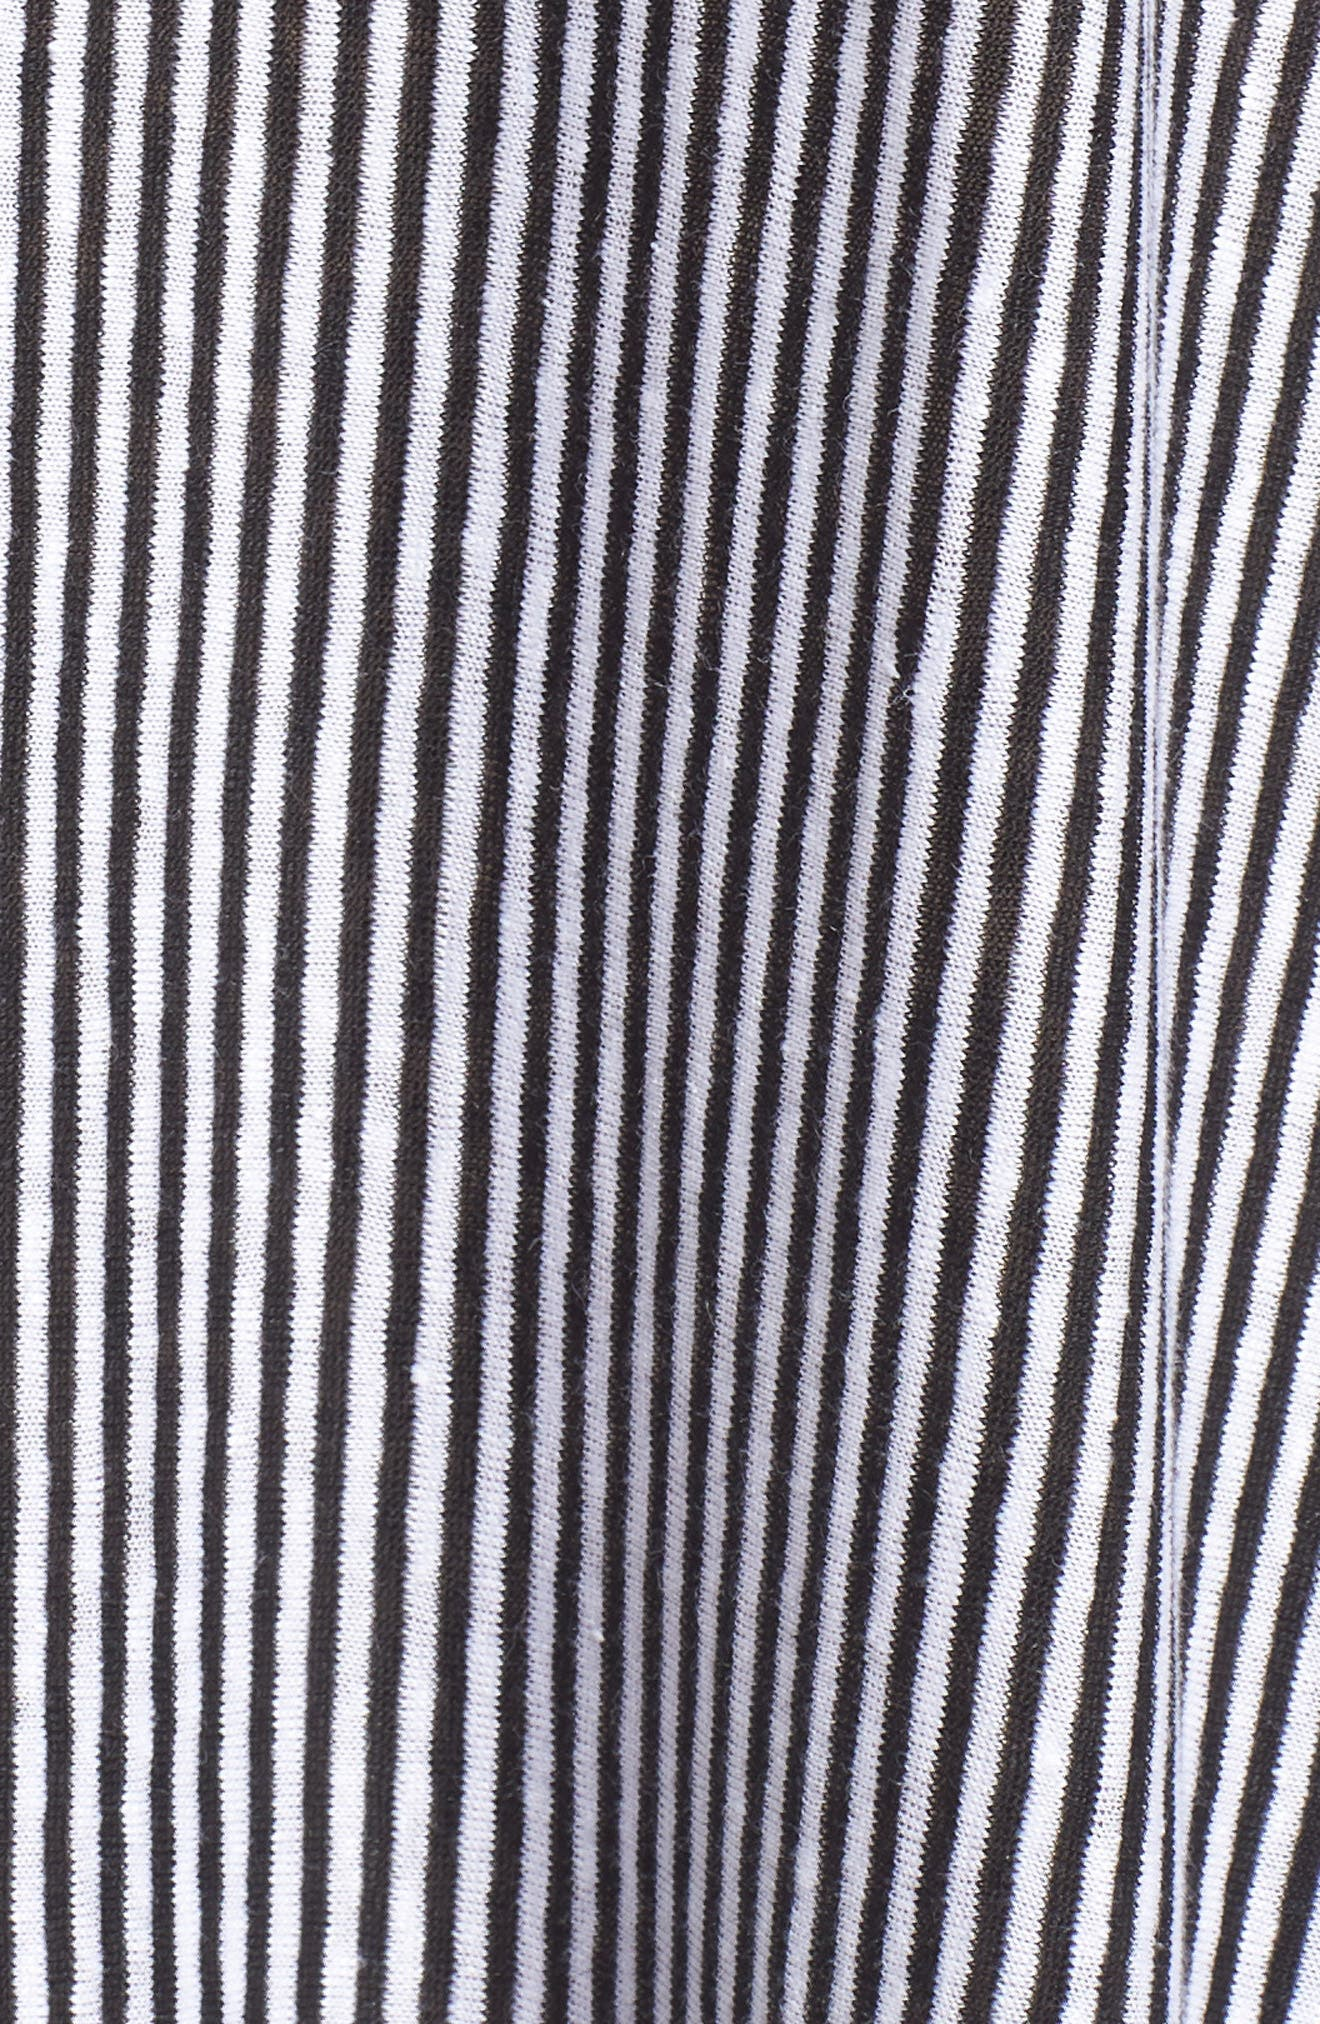 Stripe Organic Linen Jersey Shift Dress,                             Alternate thumbnail 6, color,                             018